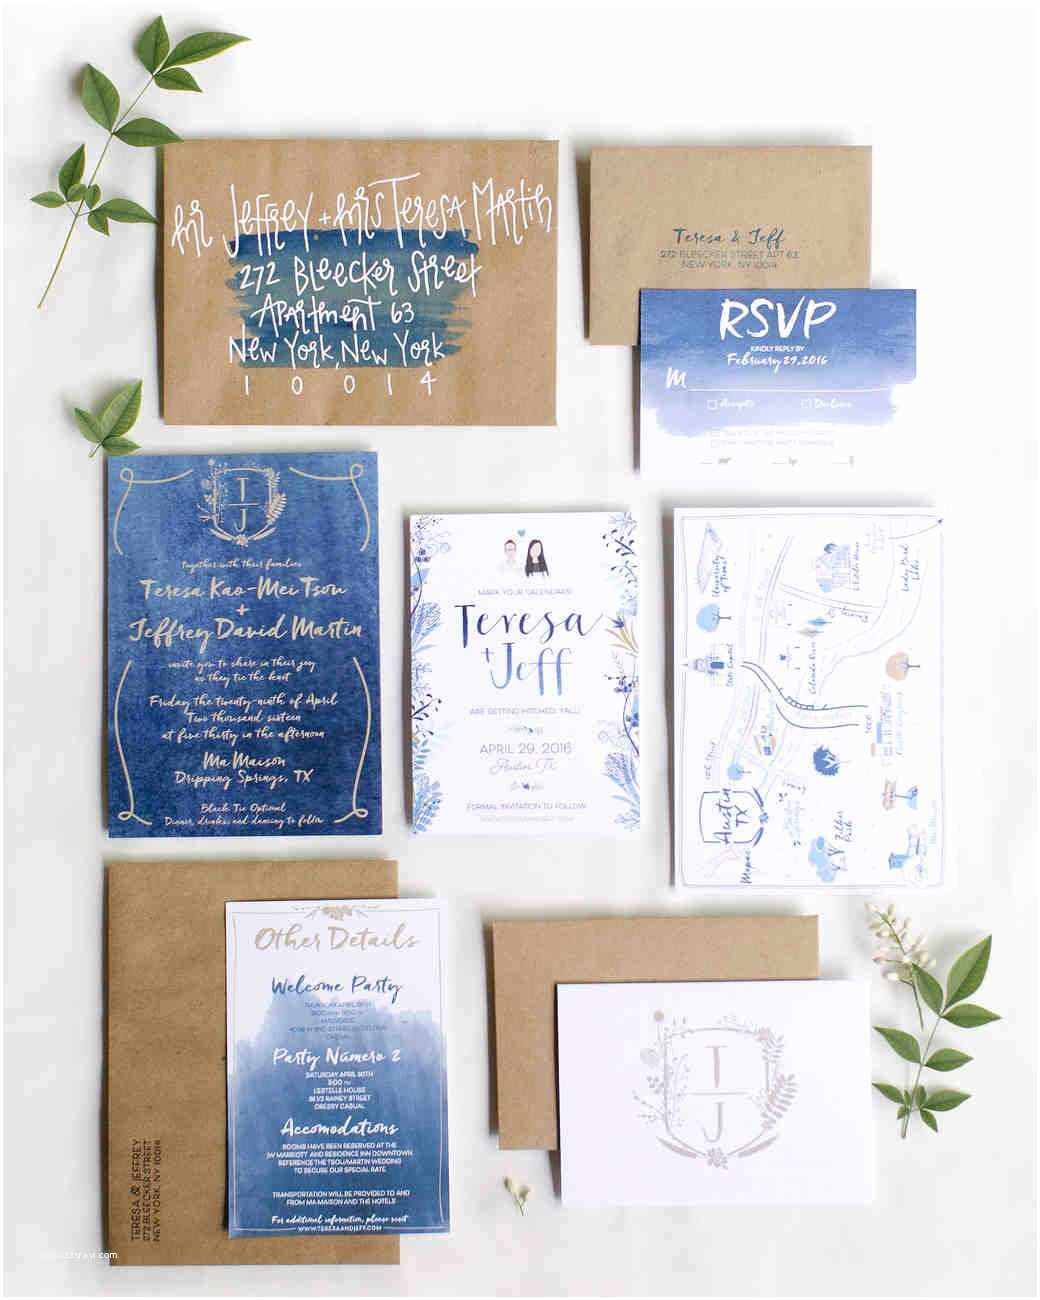 Watercolor Wedding Invitations the Loveliest Watercolor Wedding Invitations